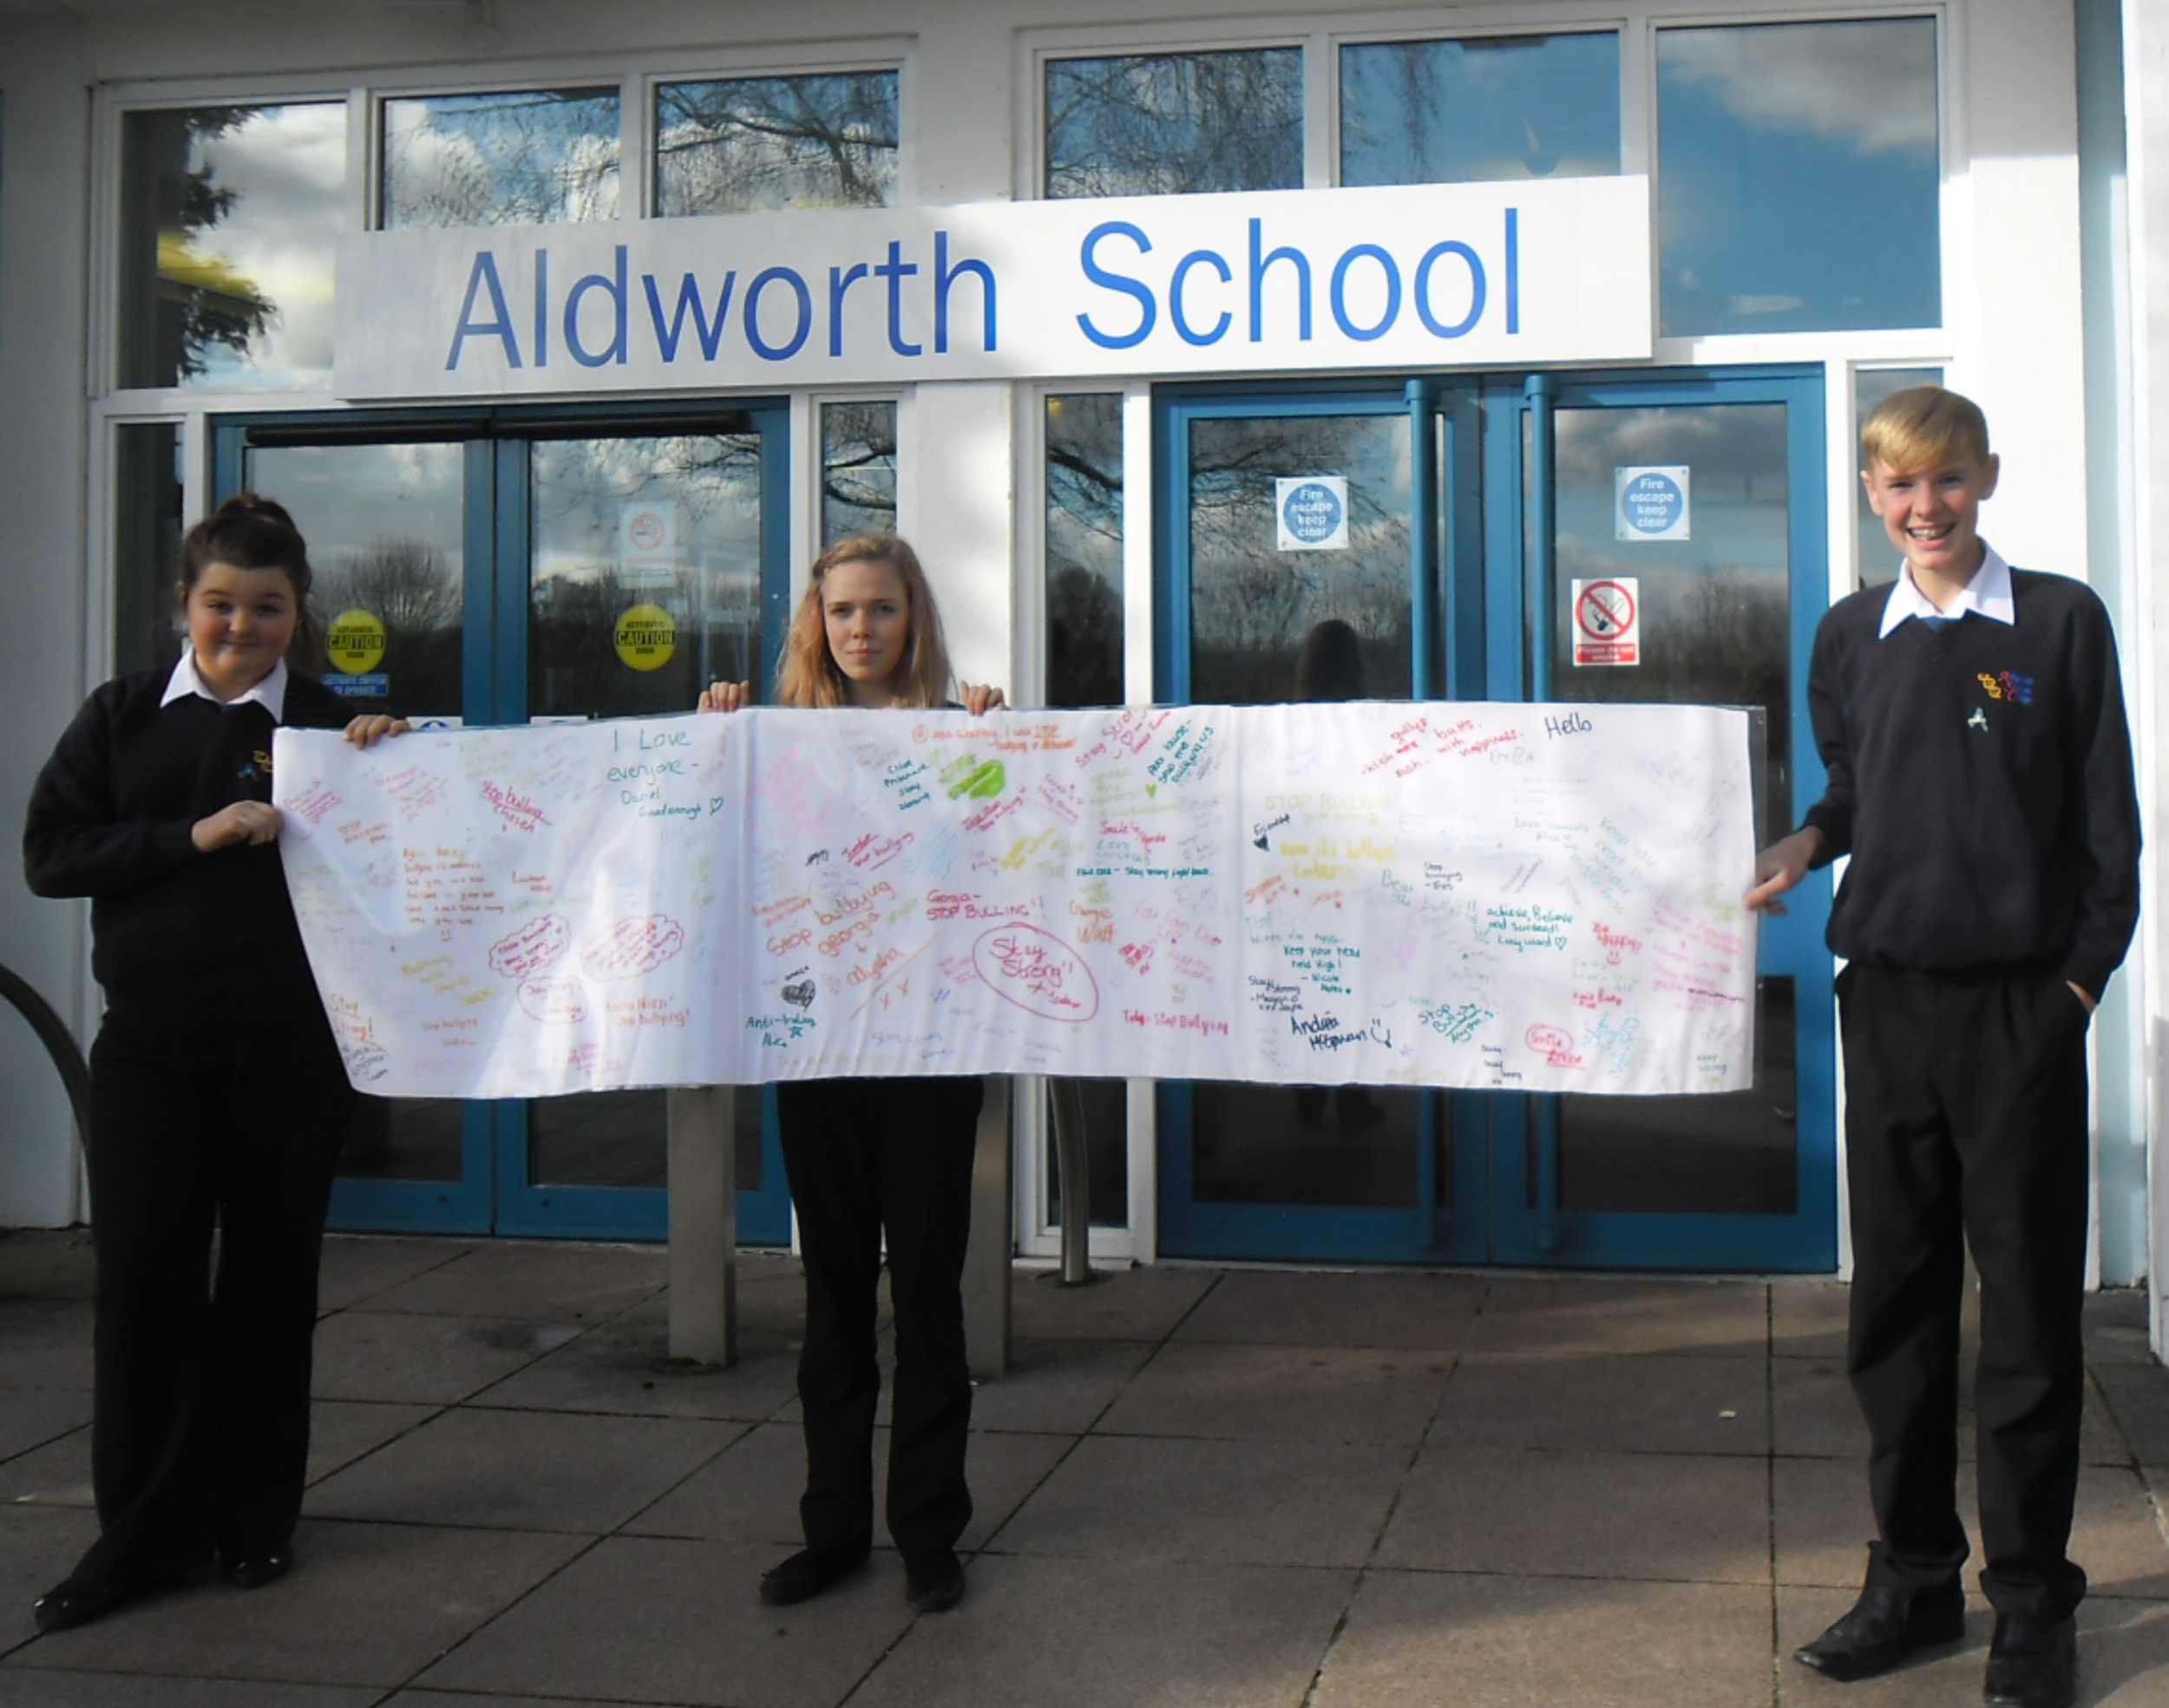 The school's Anti-Bullying pledge board